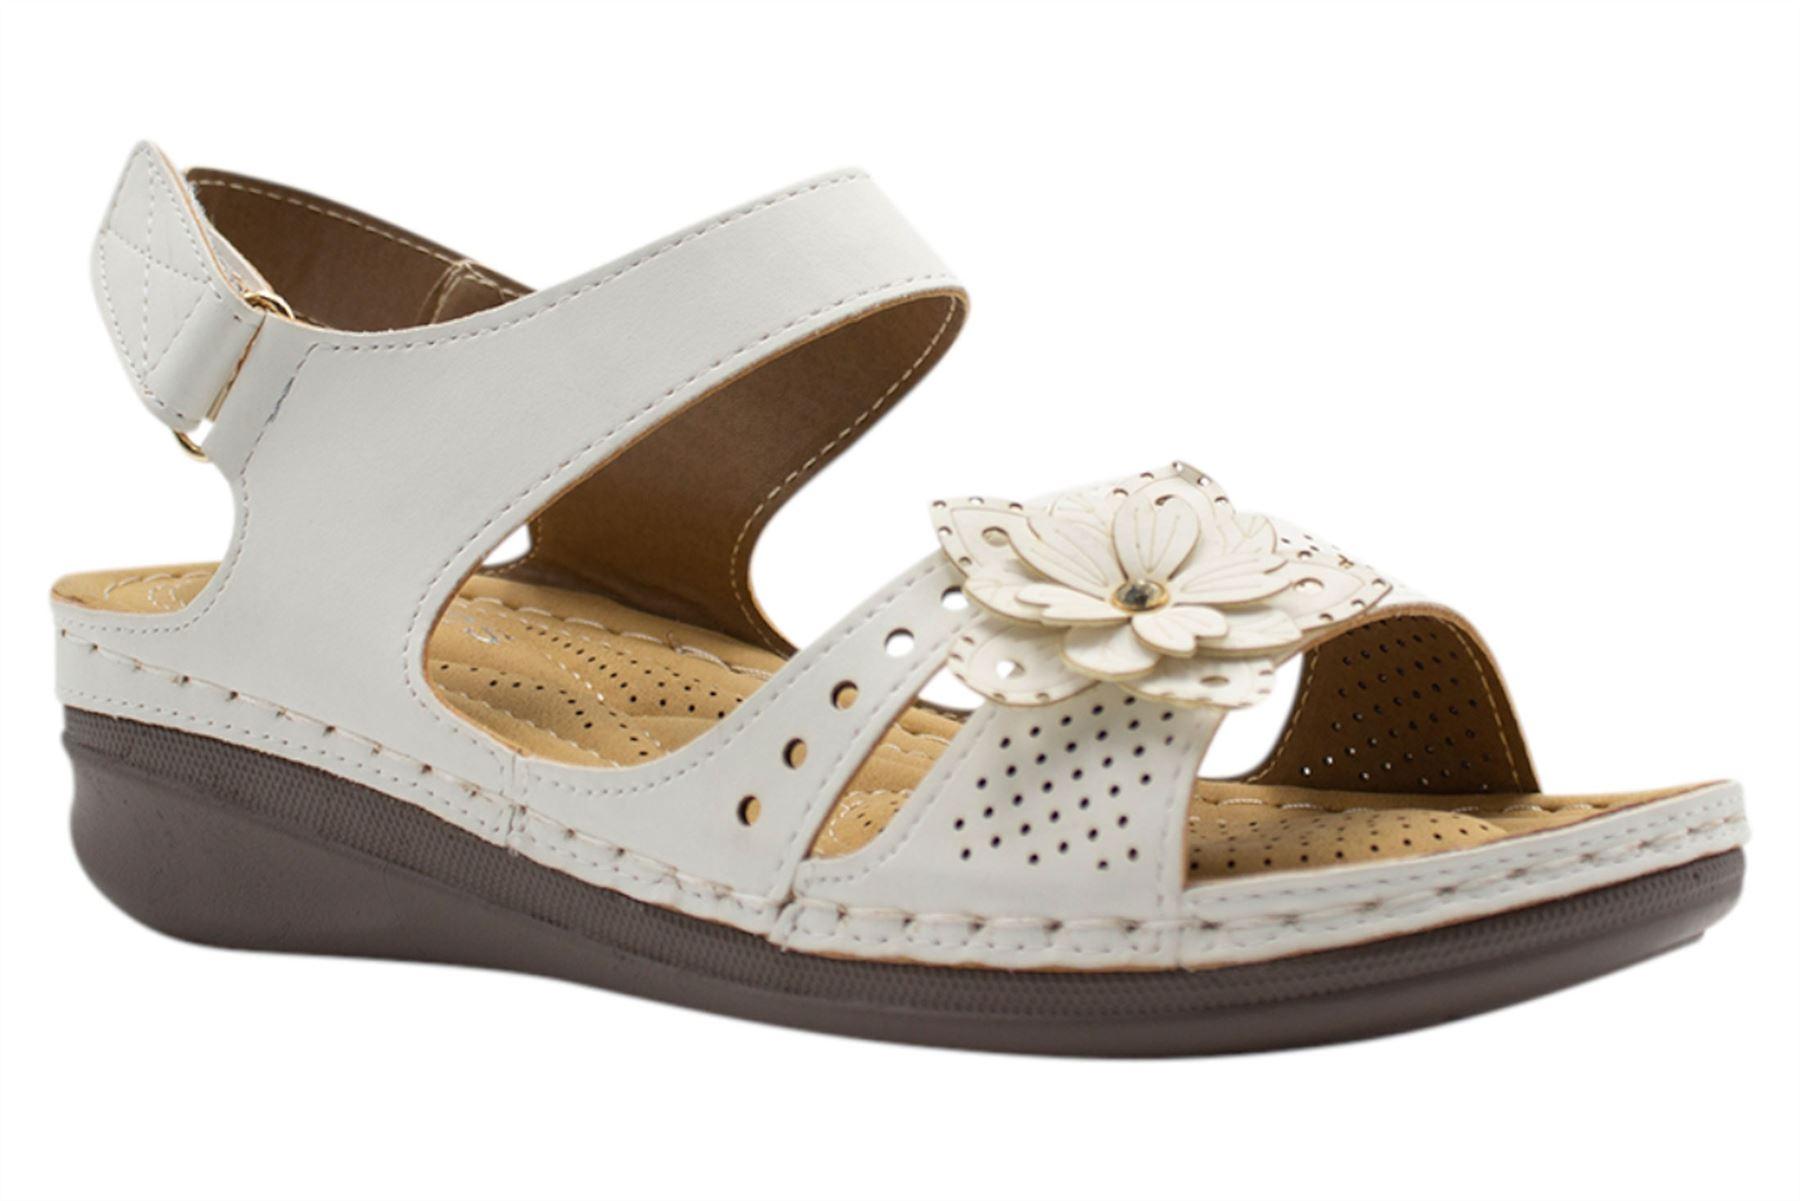 Ladies-Wedge-Heel-Sandal-Womens-Comfort-Cushion-Strapy-Summer-Shoes miniatura 45